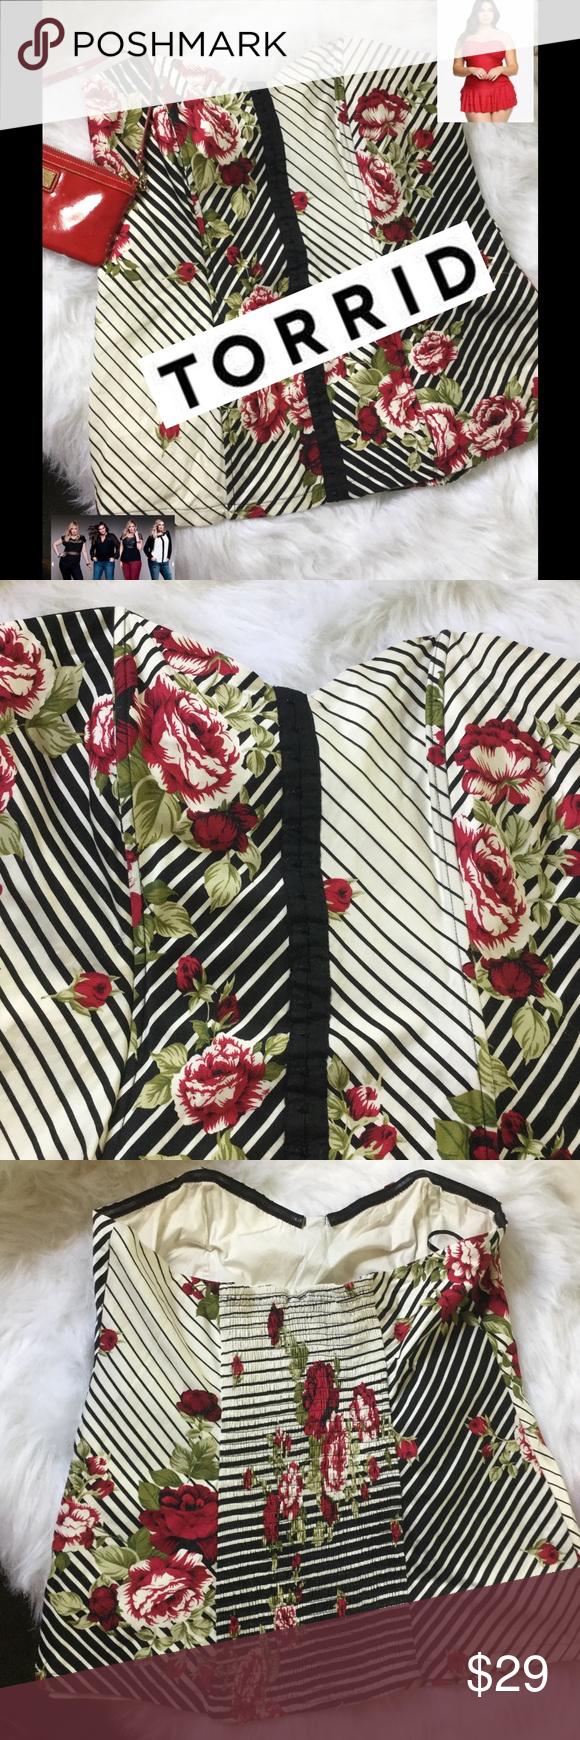 ????????FINAL PRICE????????{ TORRID } corset top - size 4   Flats, Corsets ...